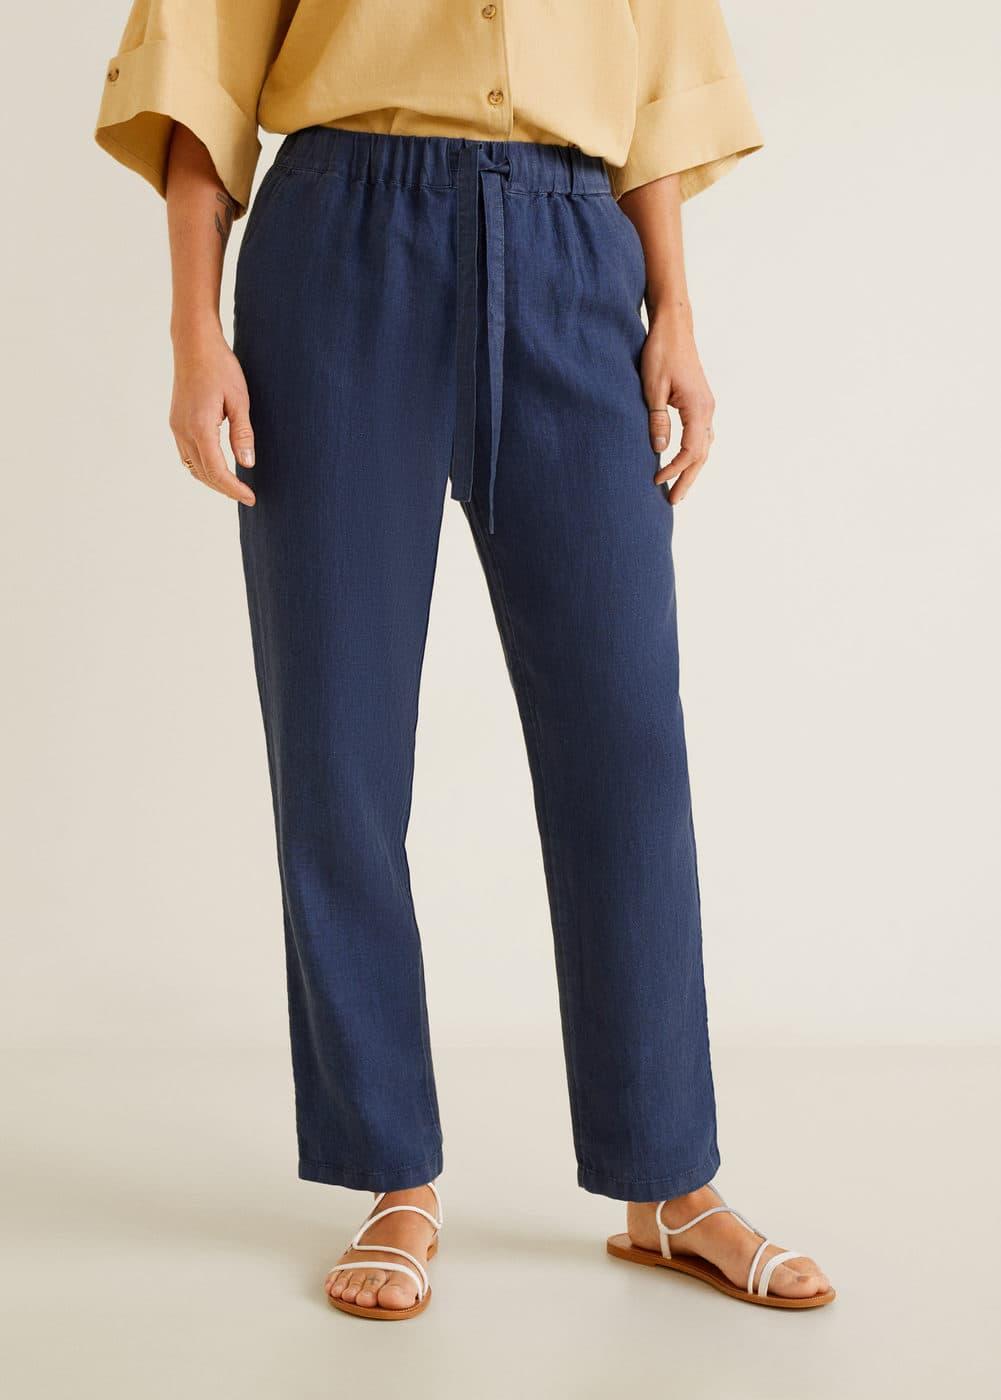 Mango - Straight linen-blend trousers - 1